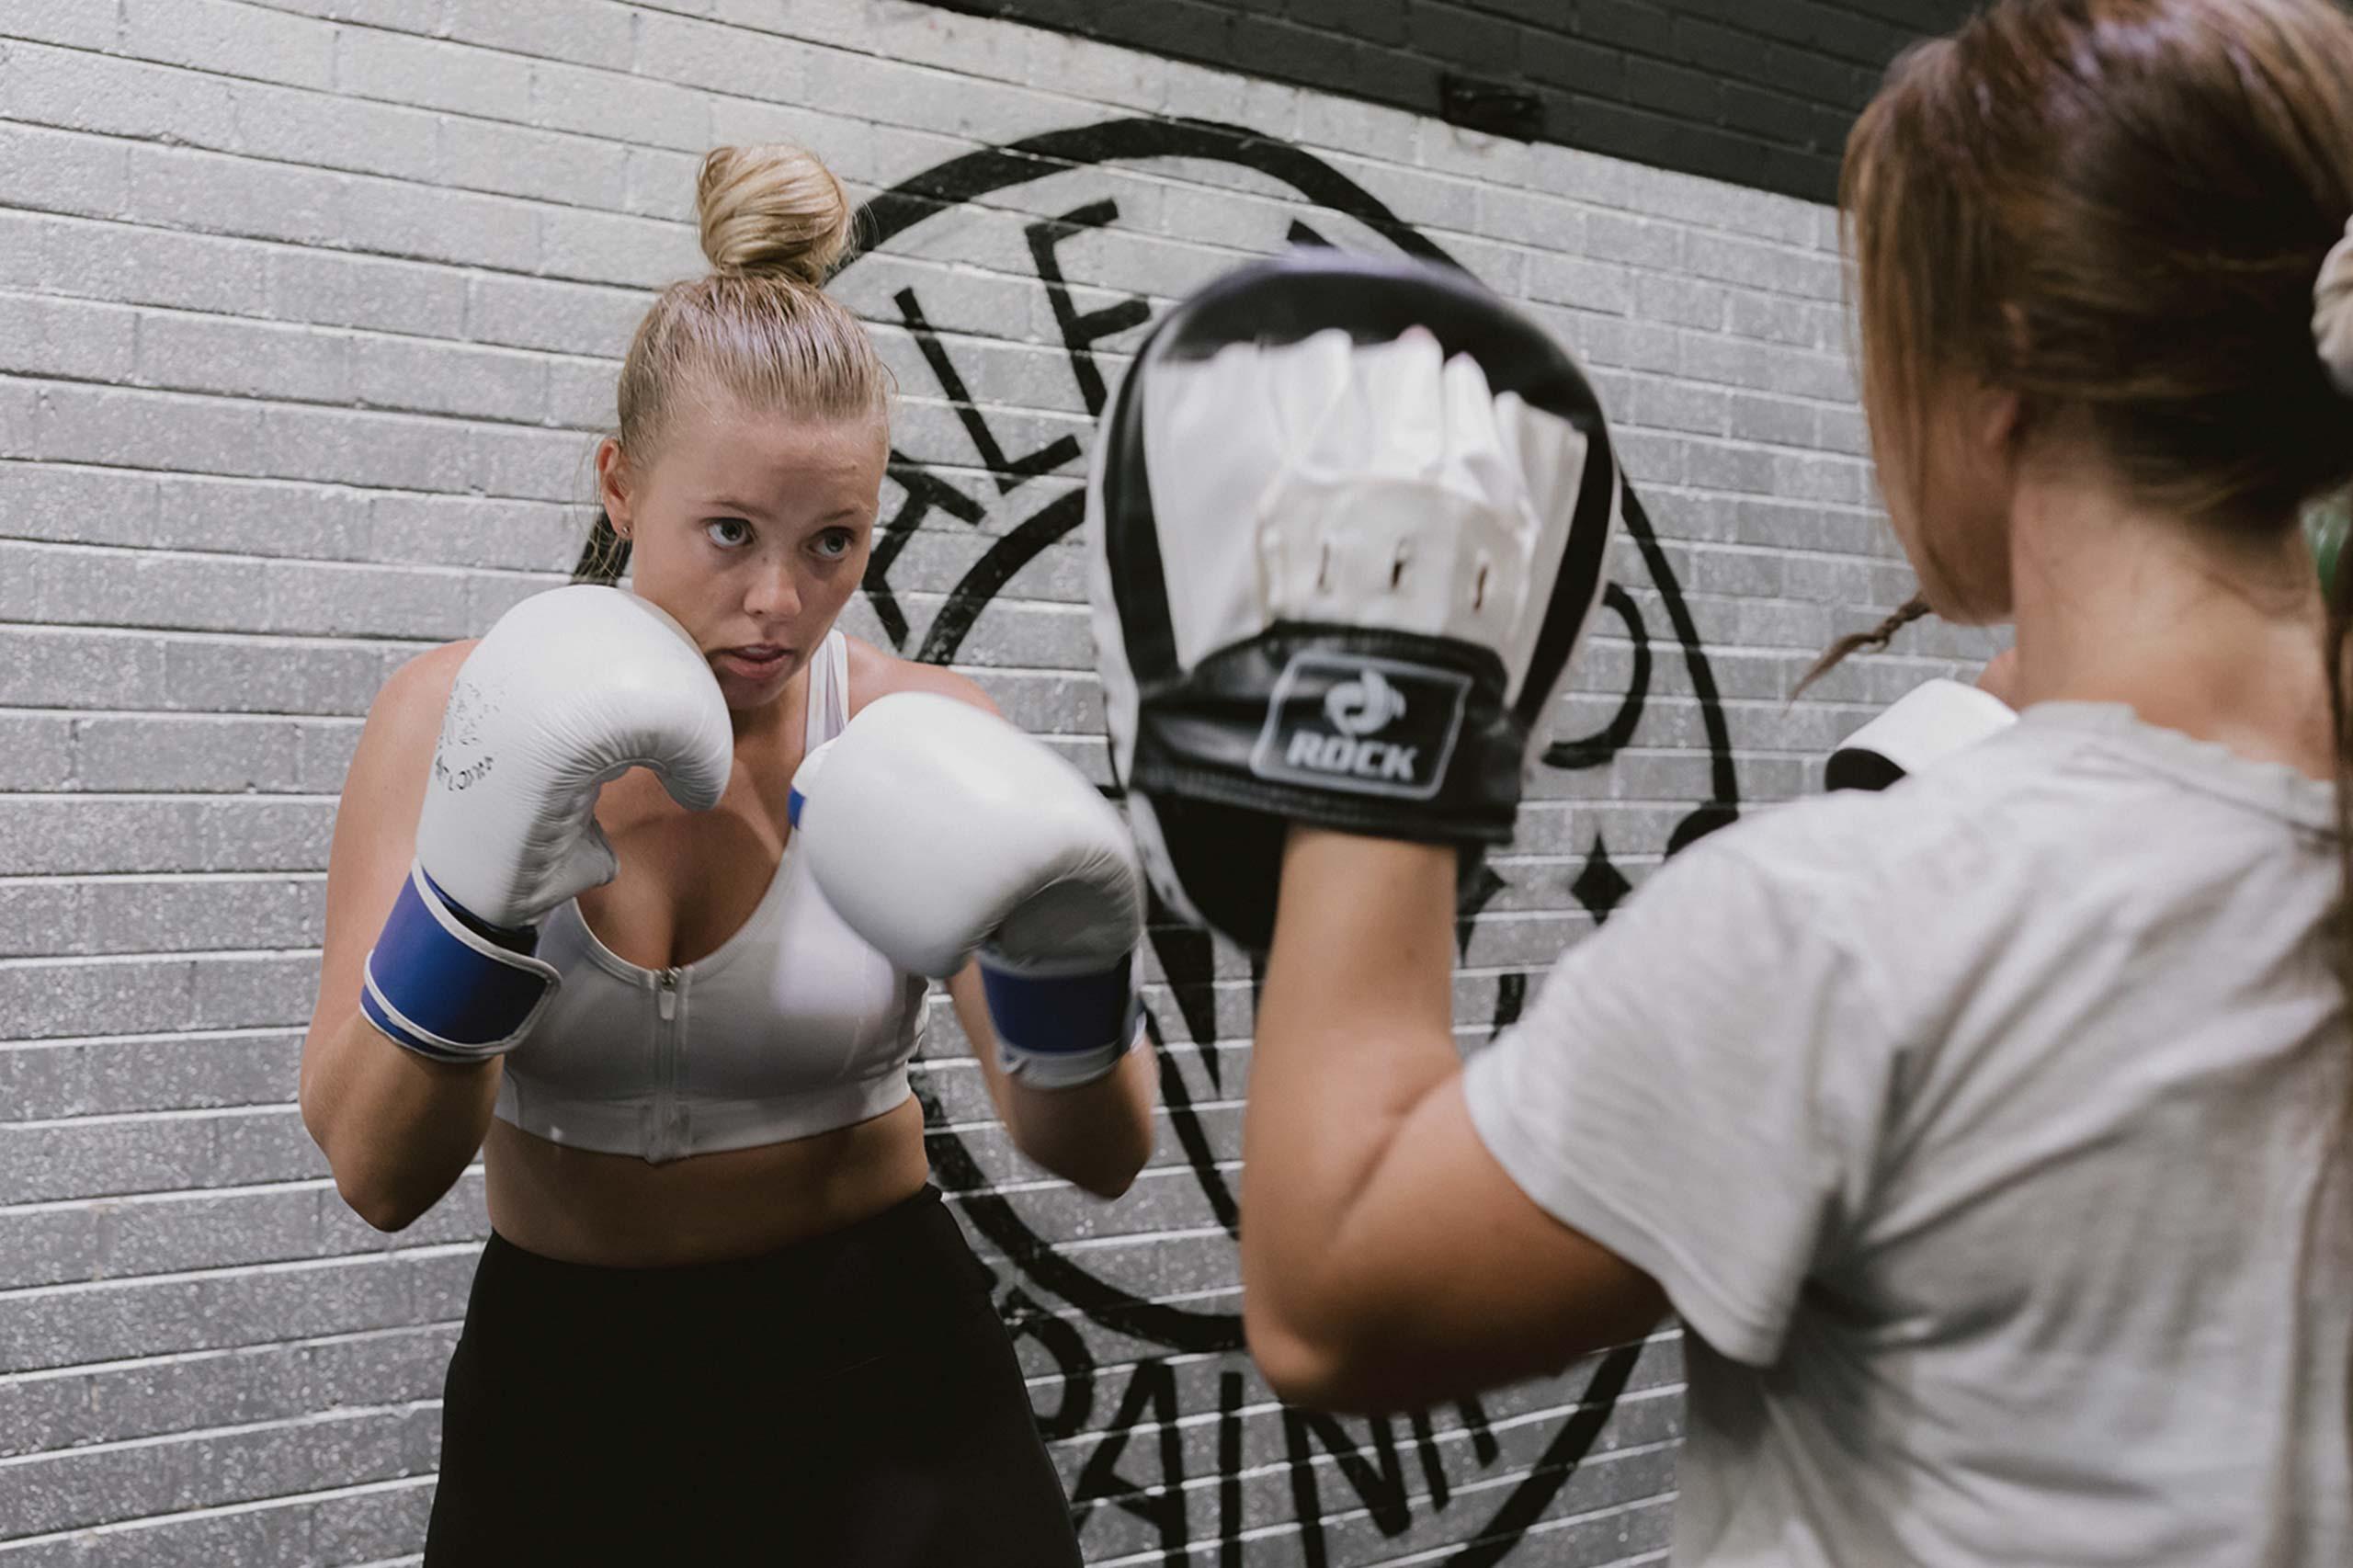 female athletes sparring in boxing training exercise